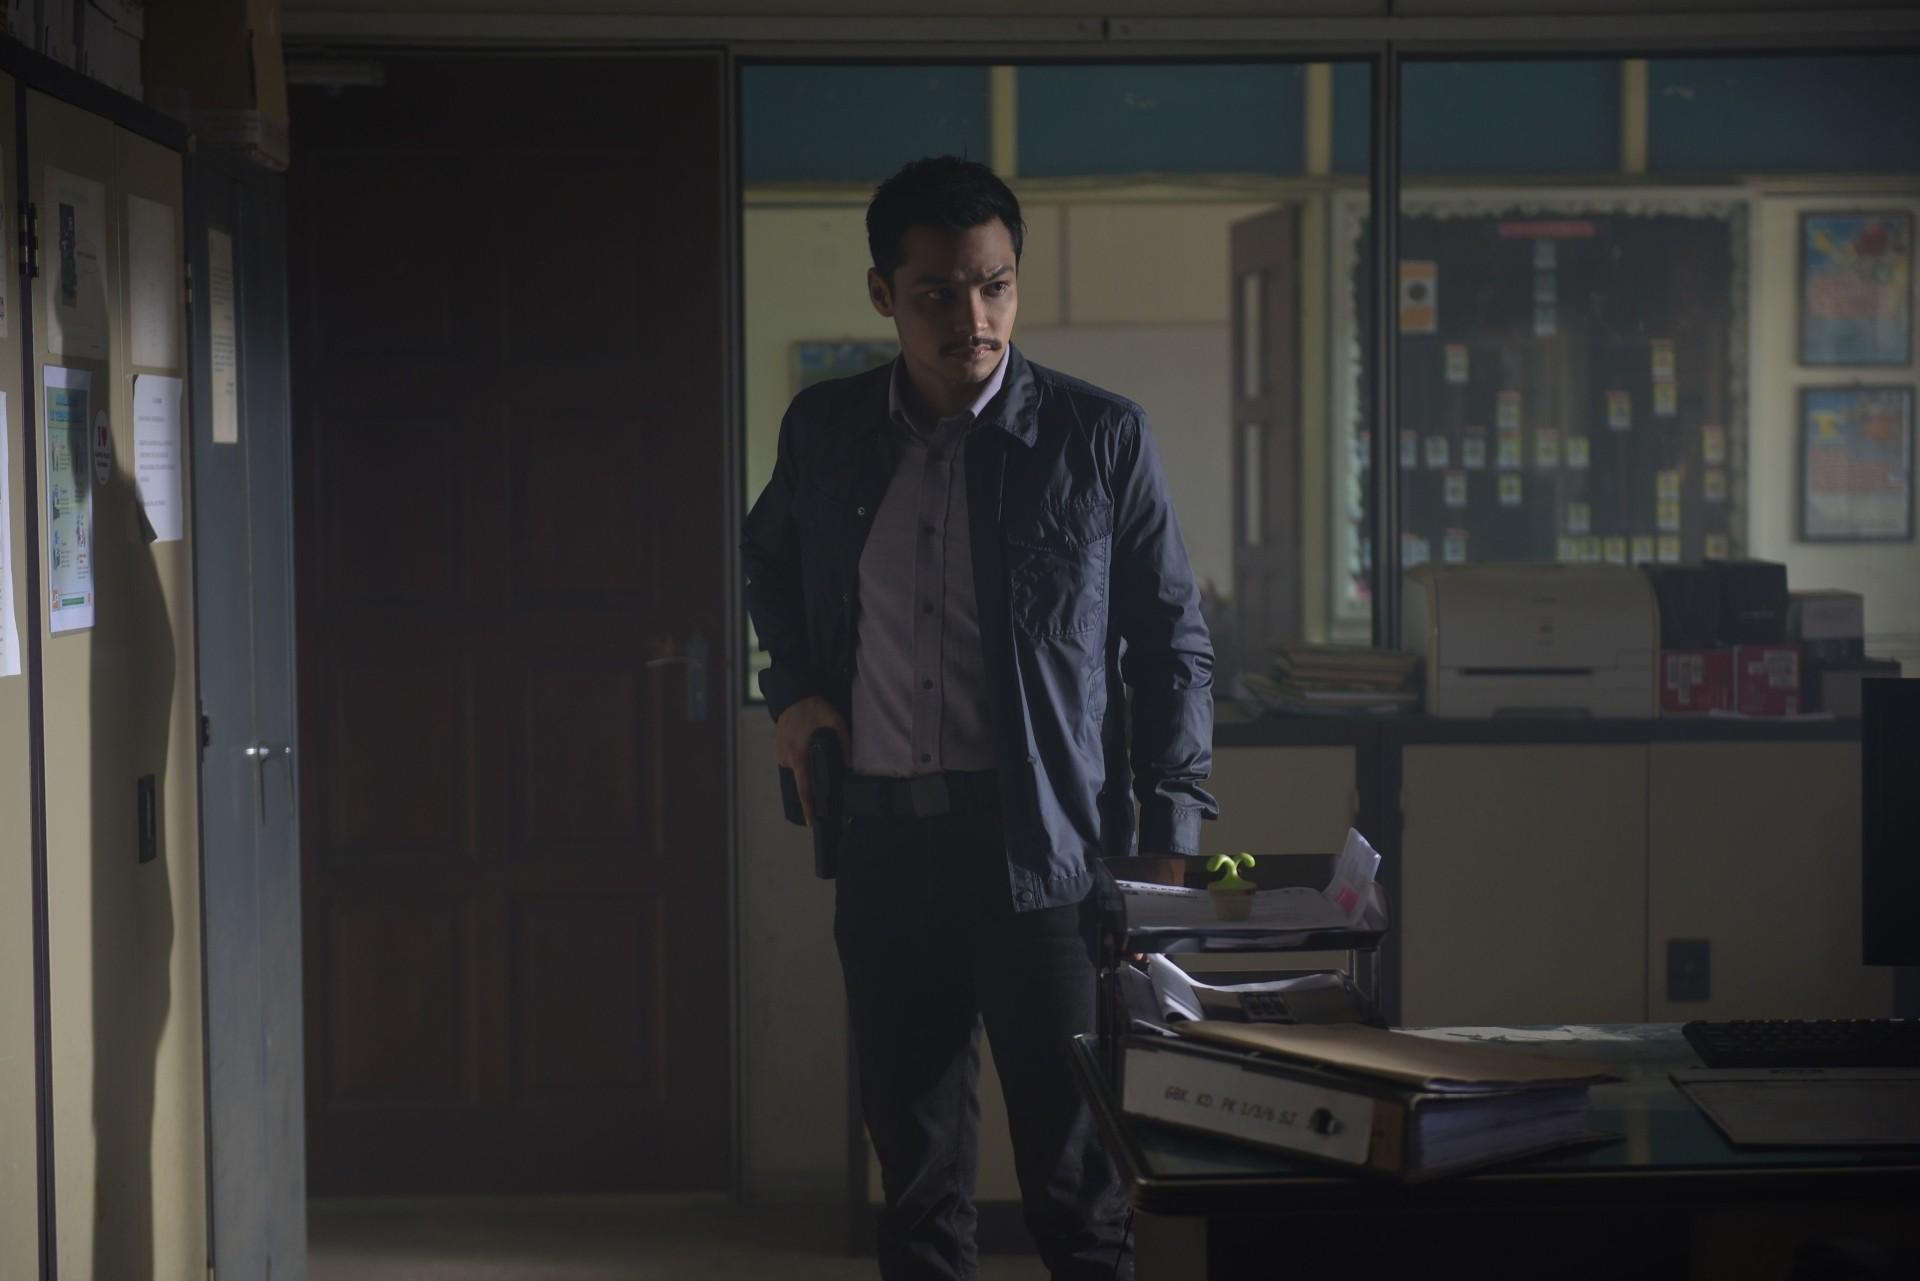 Syafiq Kyle plays Inspector Nuar who is caught in a bizarre case involving black magic.